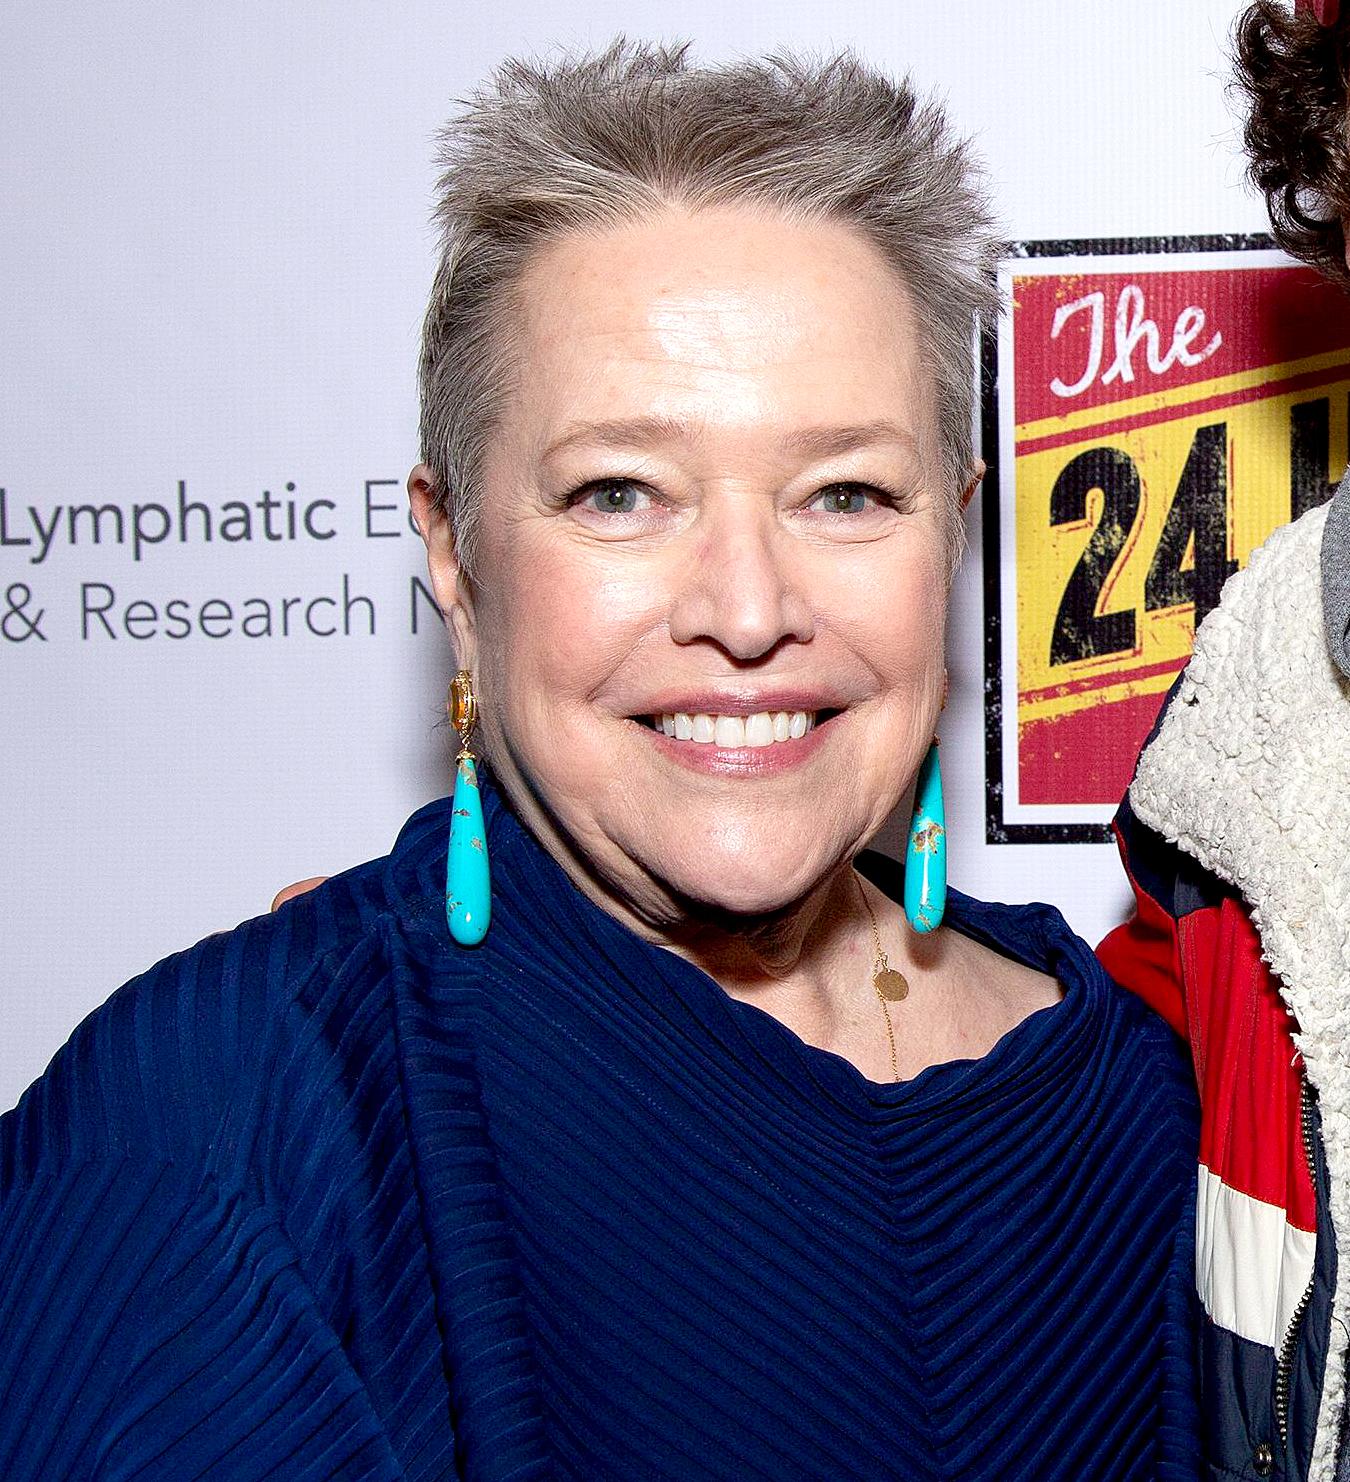 Kathy-Bates-Surviving-Cancer-Twice